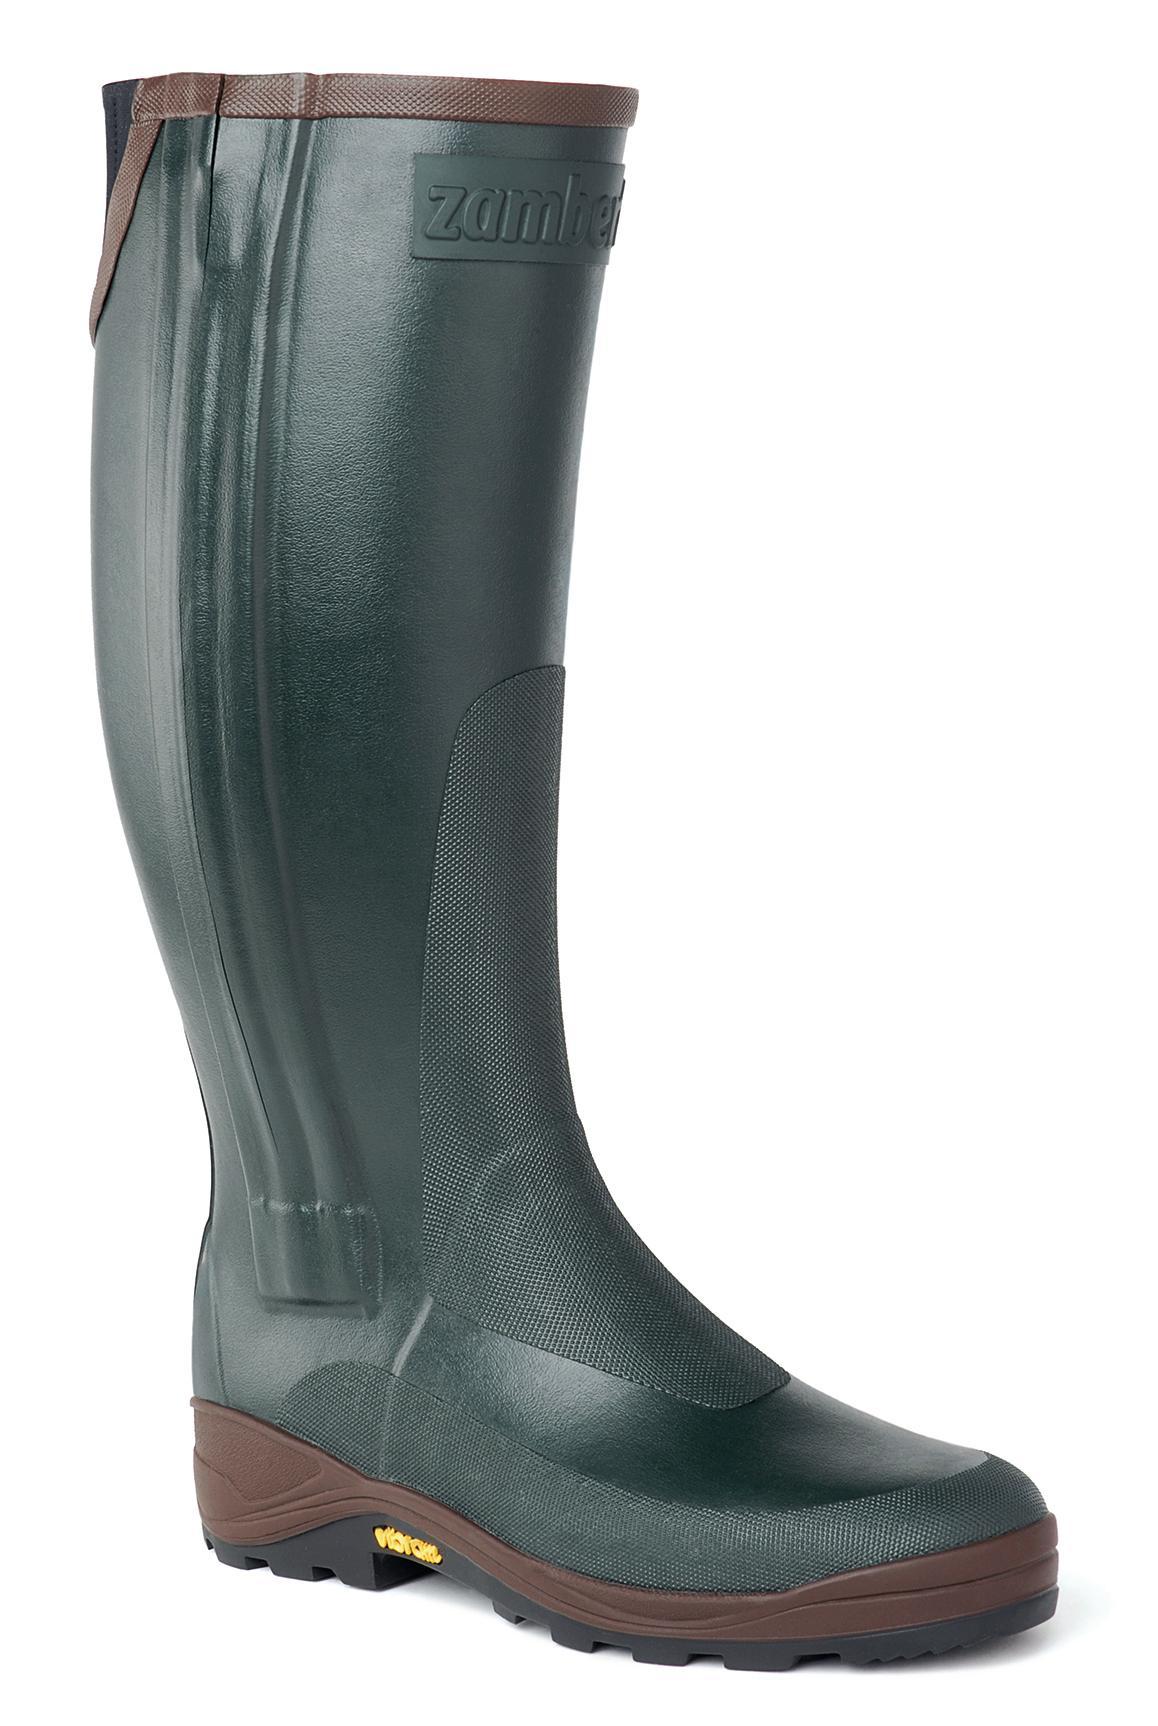 S10 BOOTS  CANADA N.   -     Gummistiefel   -   Dark Green